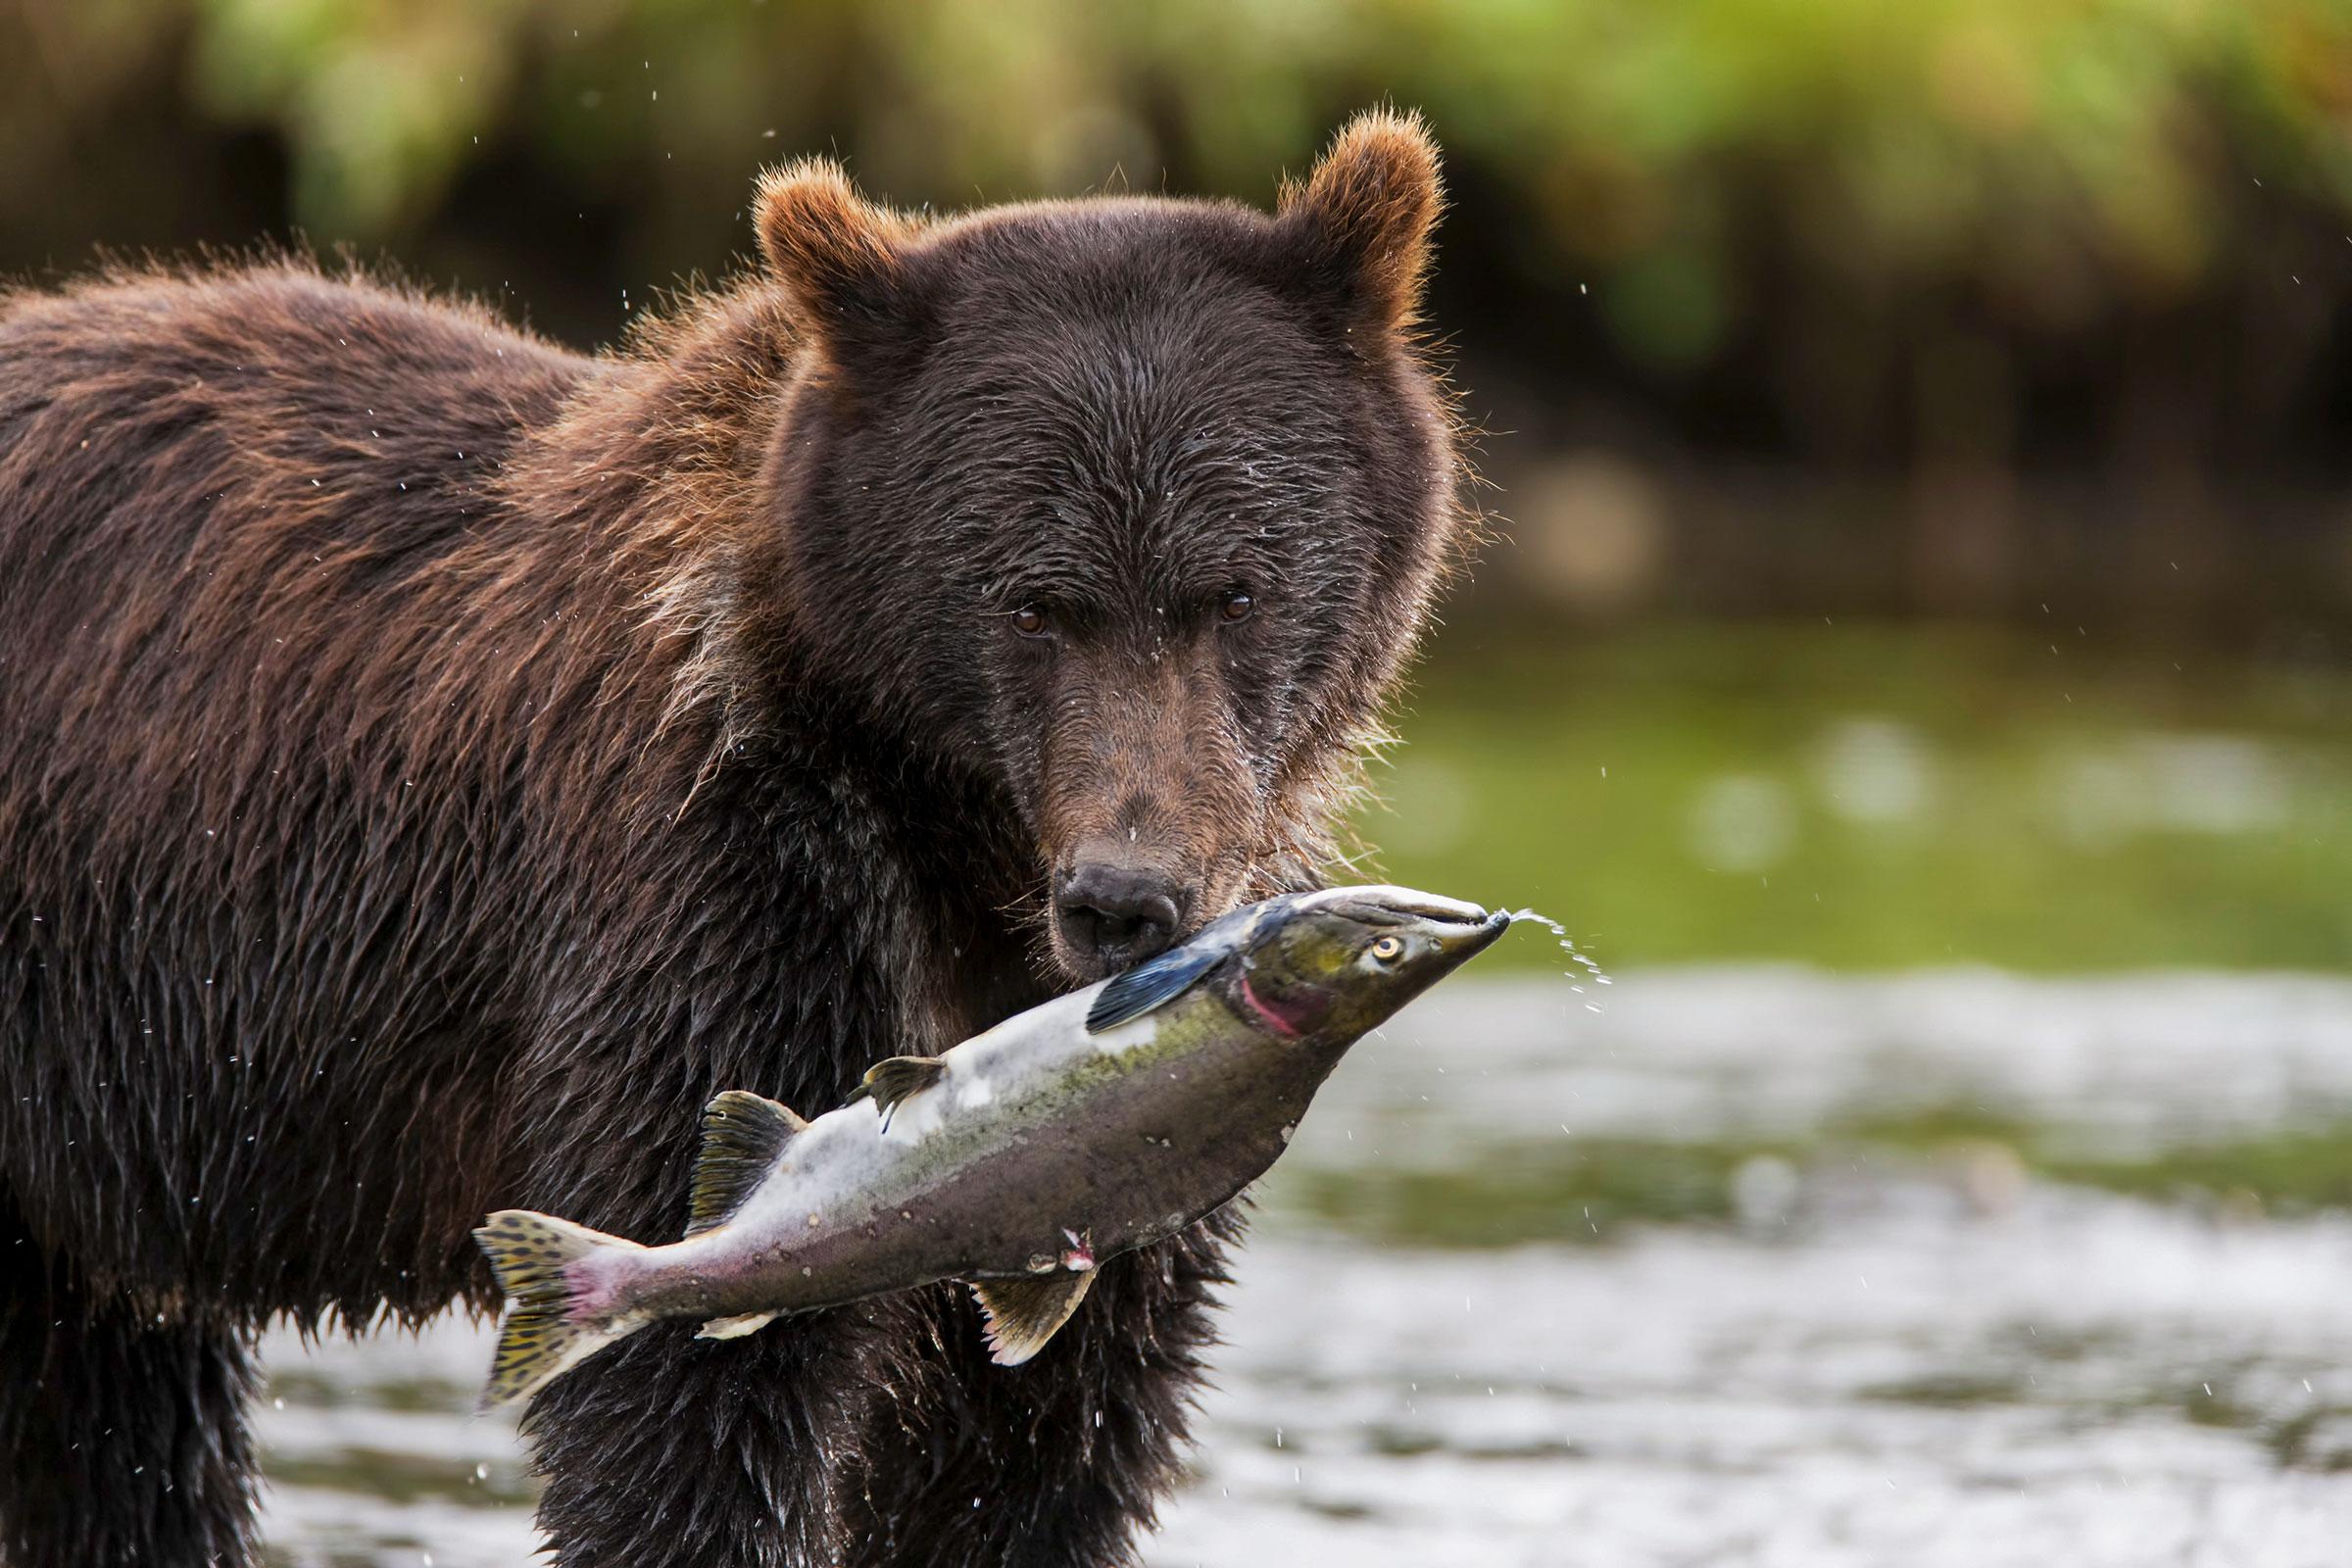 Admiralty Island brown bear. Ray Bulson/Alamy